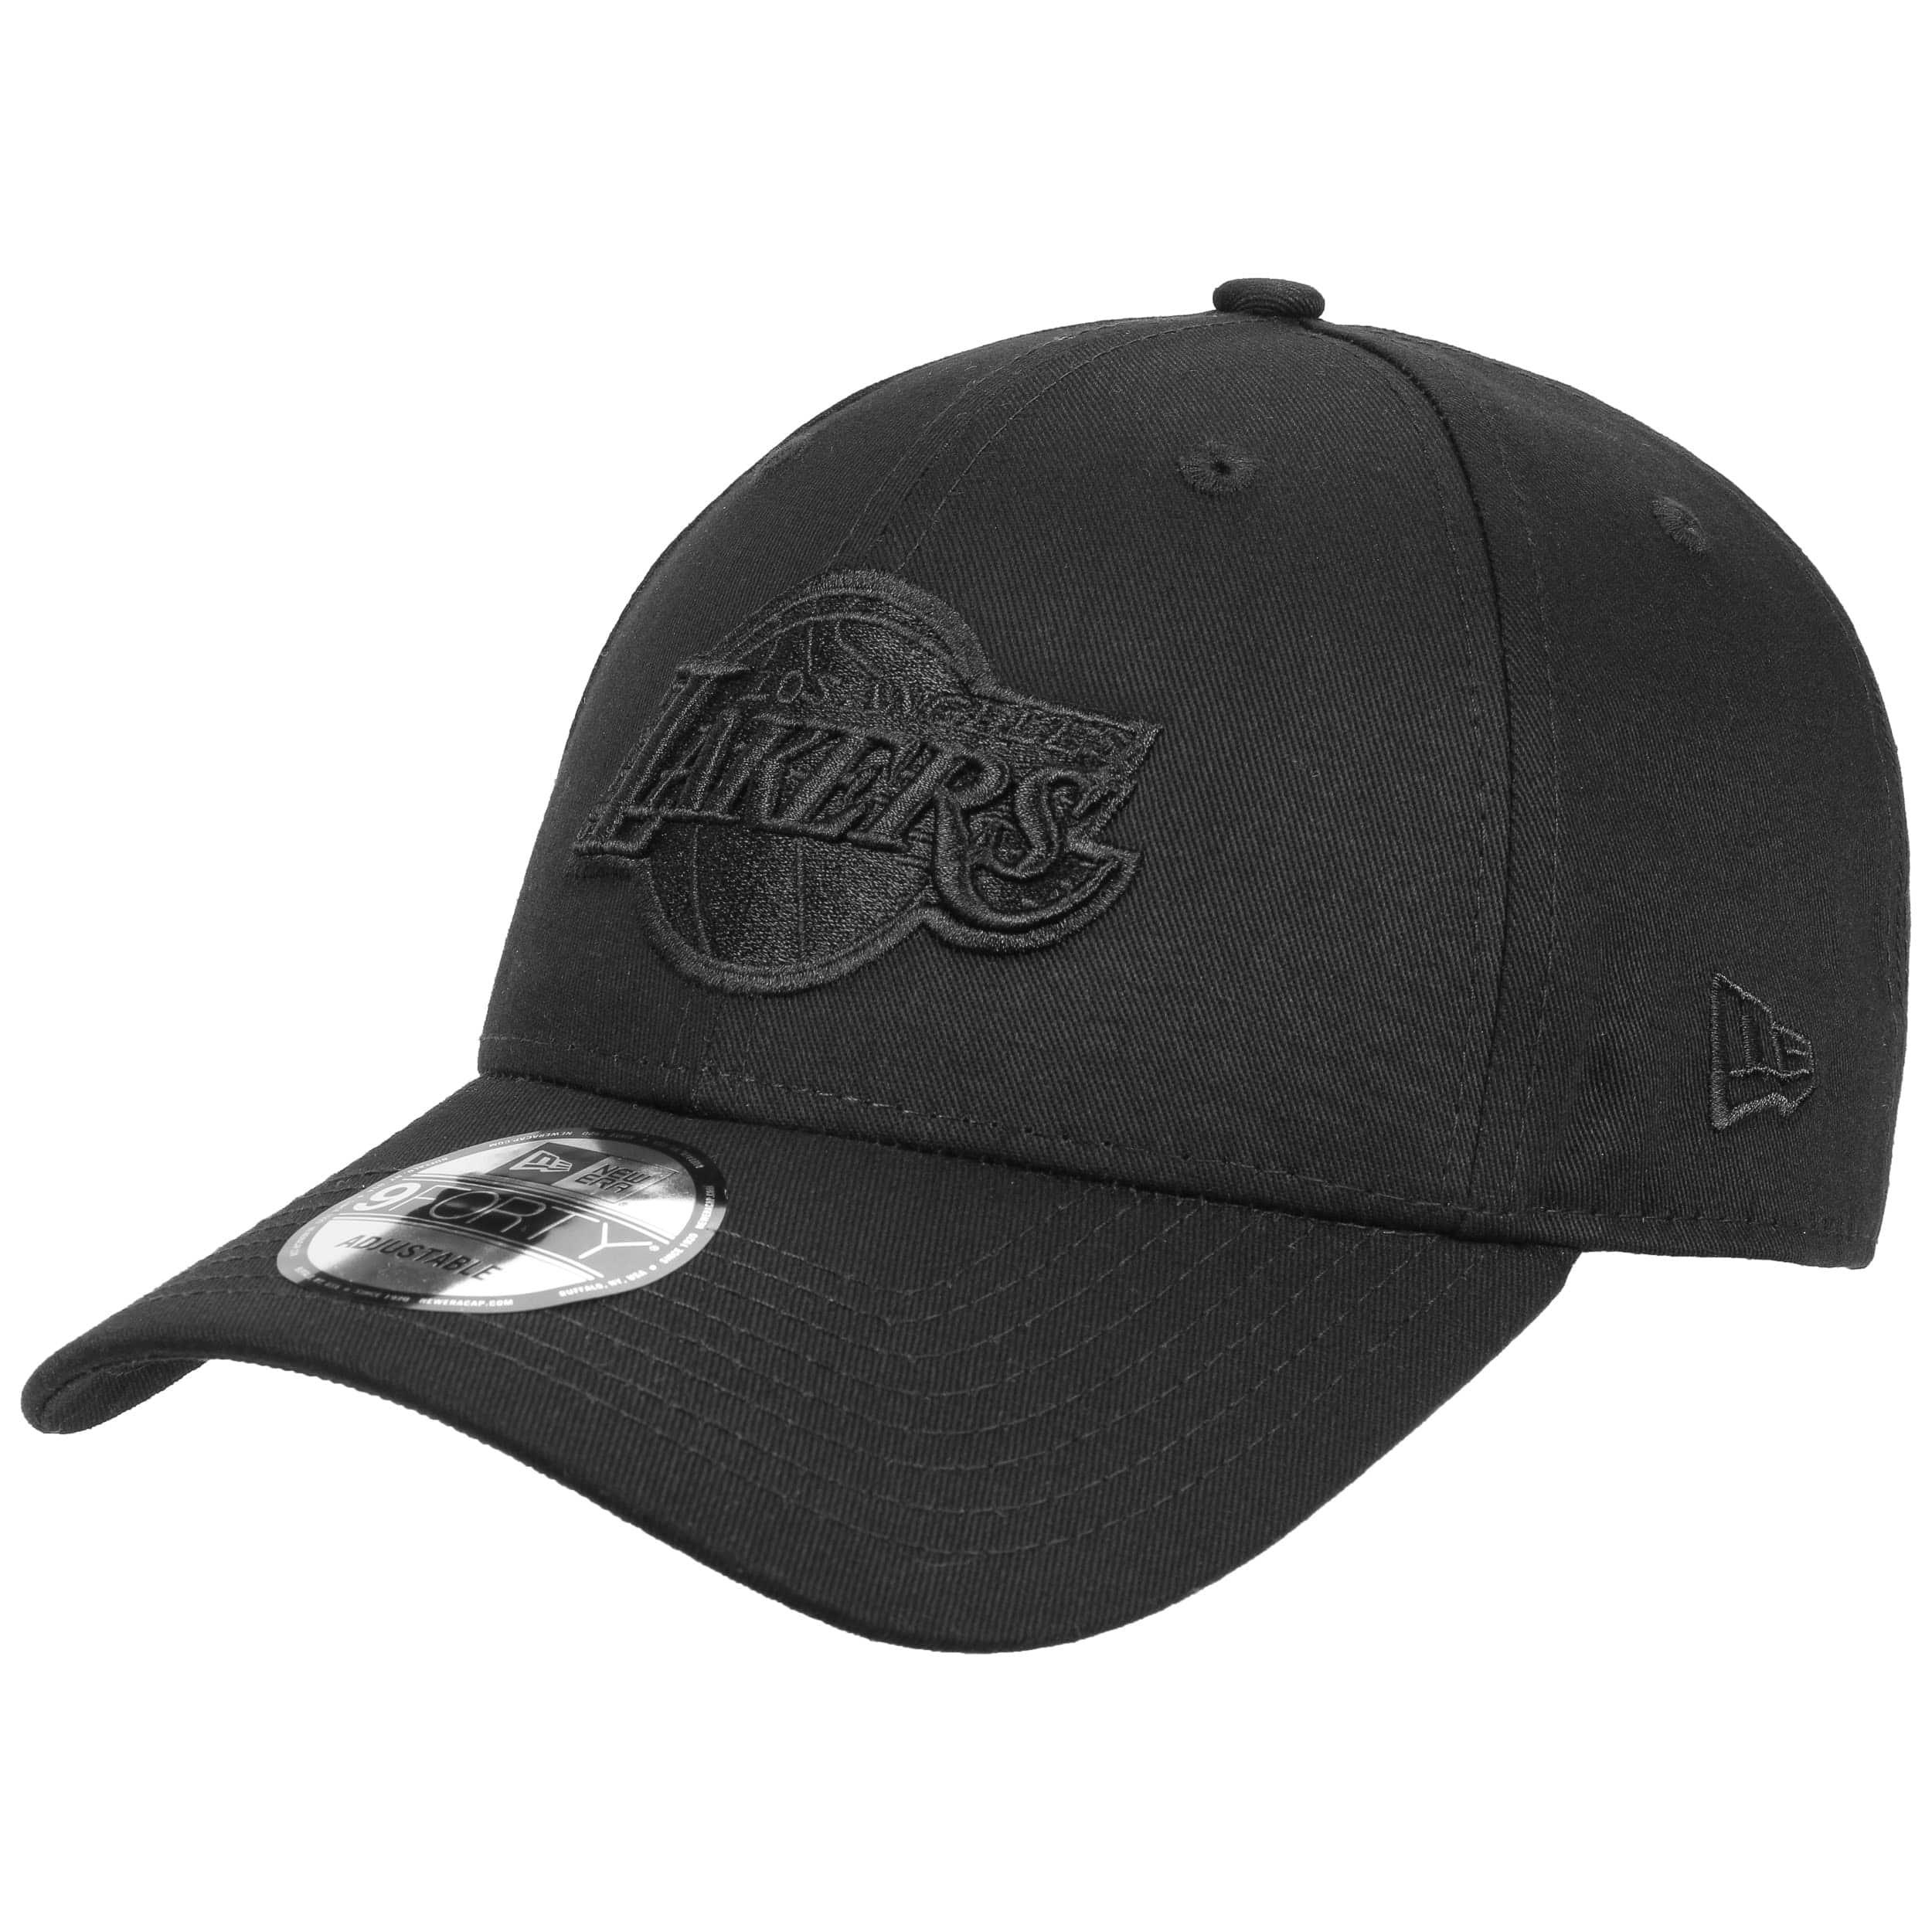 9forty bob la lakers cap by new era eur 24 95 hats caps beanies shop online. Black Bedroom Furniture Sets. Home Design Ideas